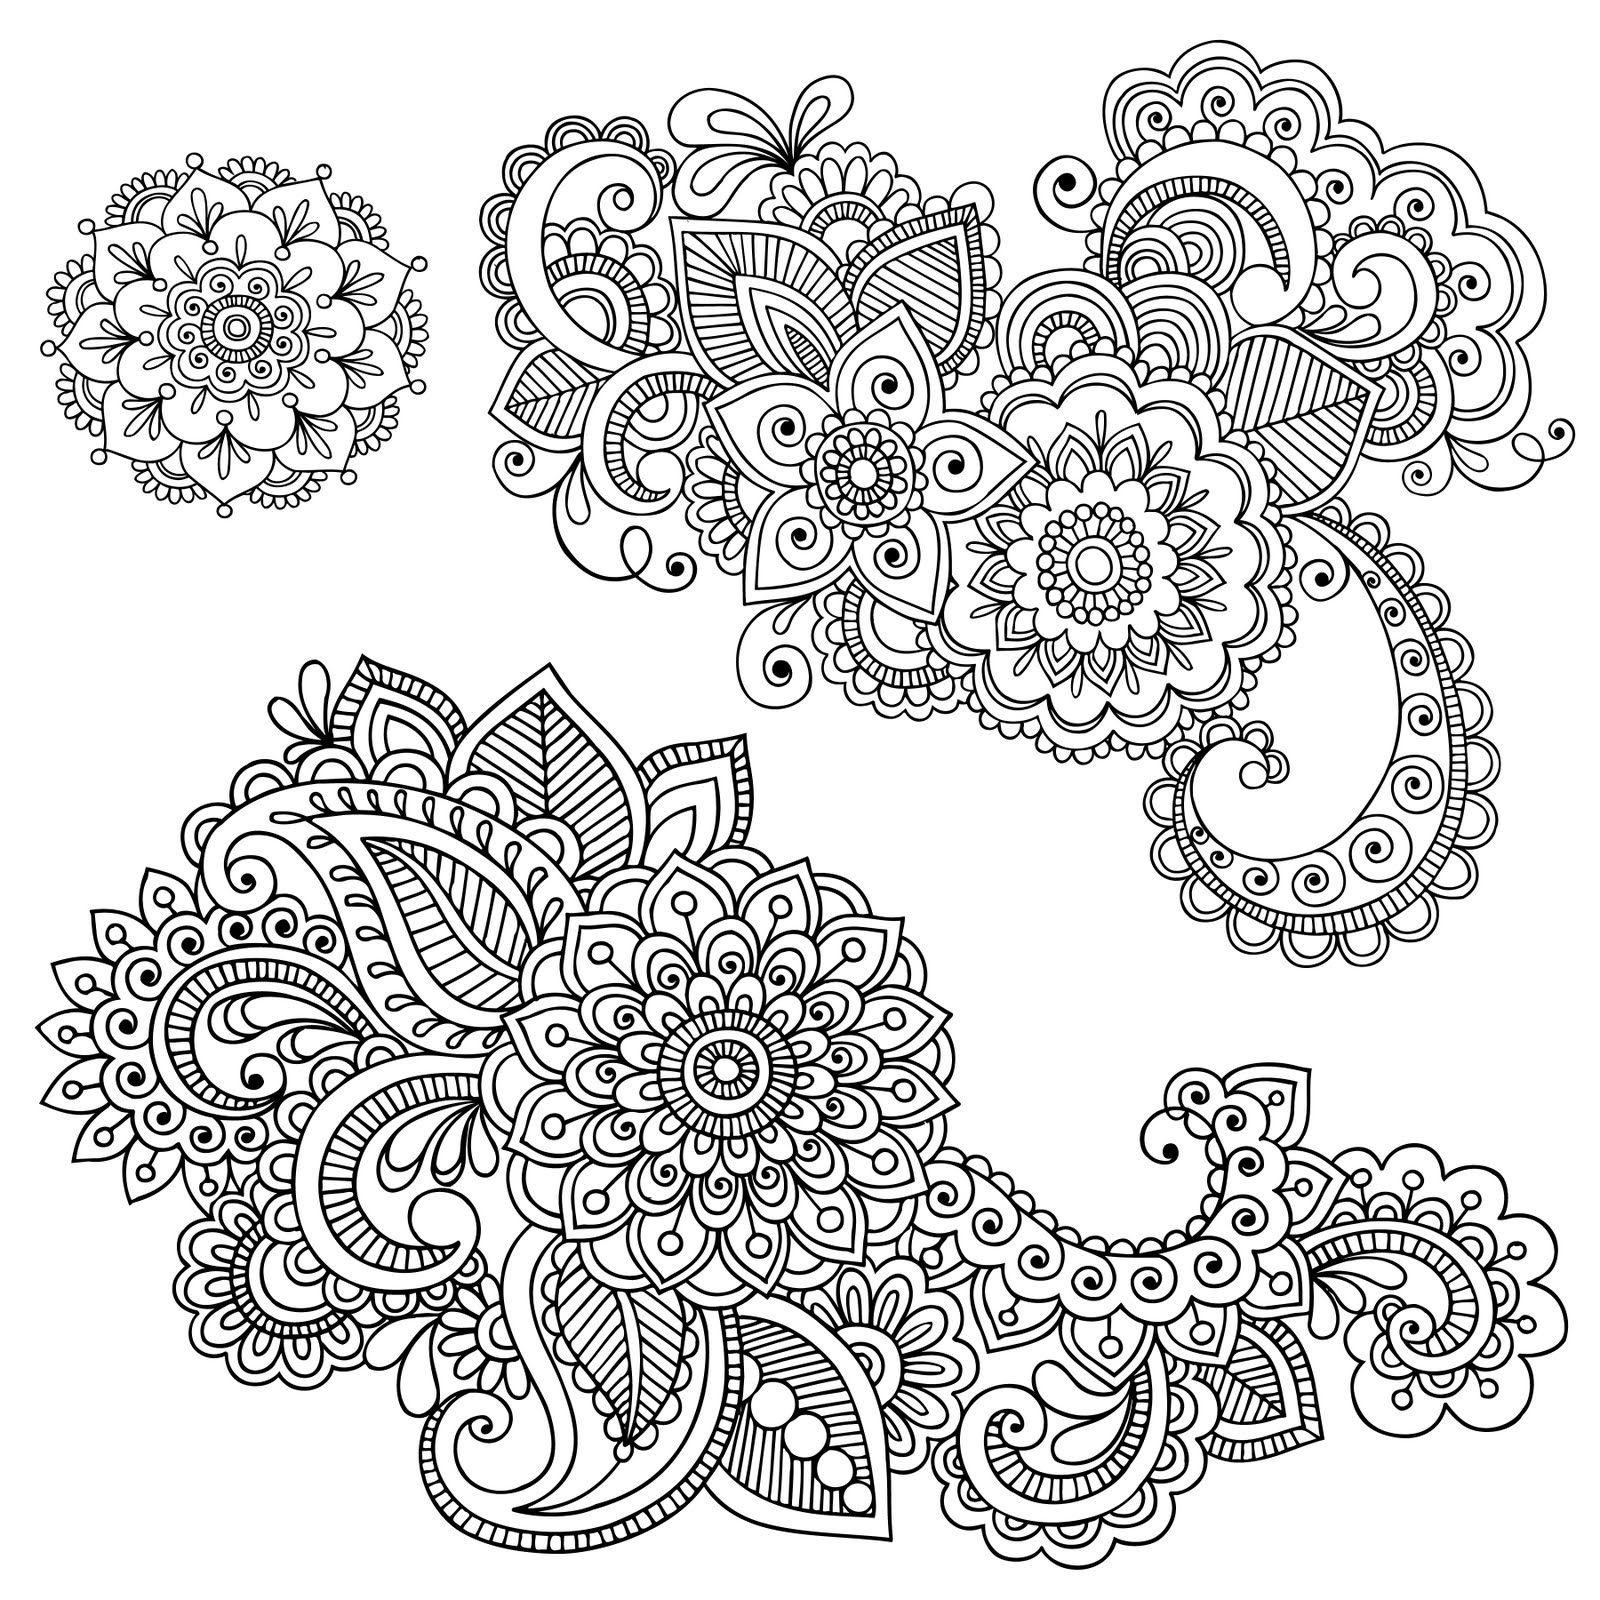 Free Printable Graphics.   Crafts   Mandalas, Dibujos Henna - Free Printable Henna Tattoo Designs